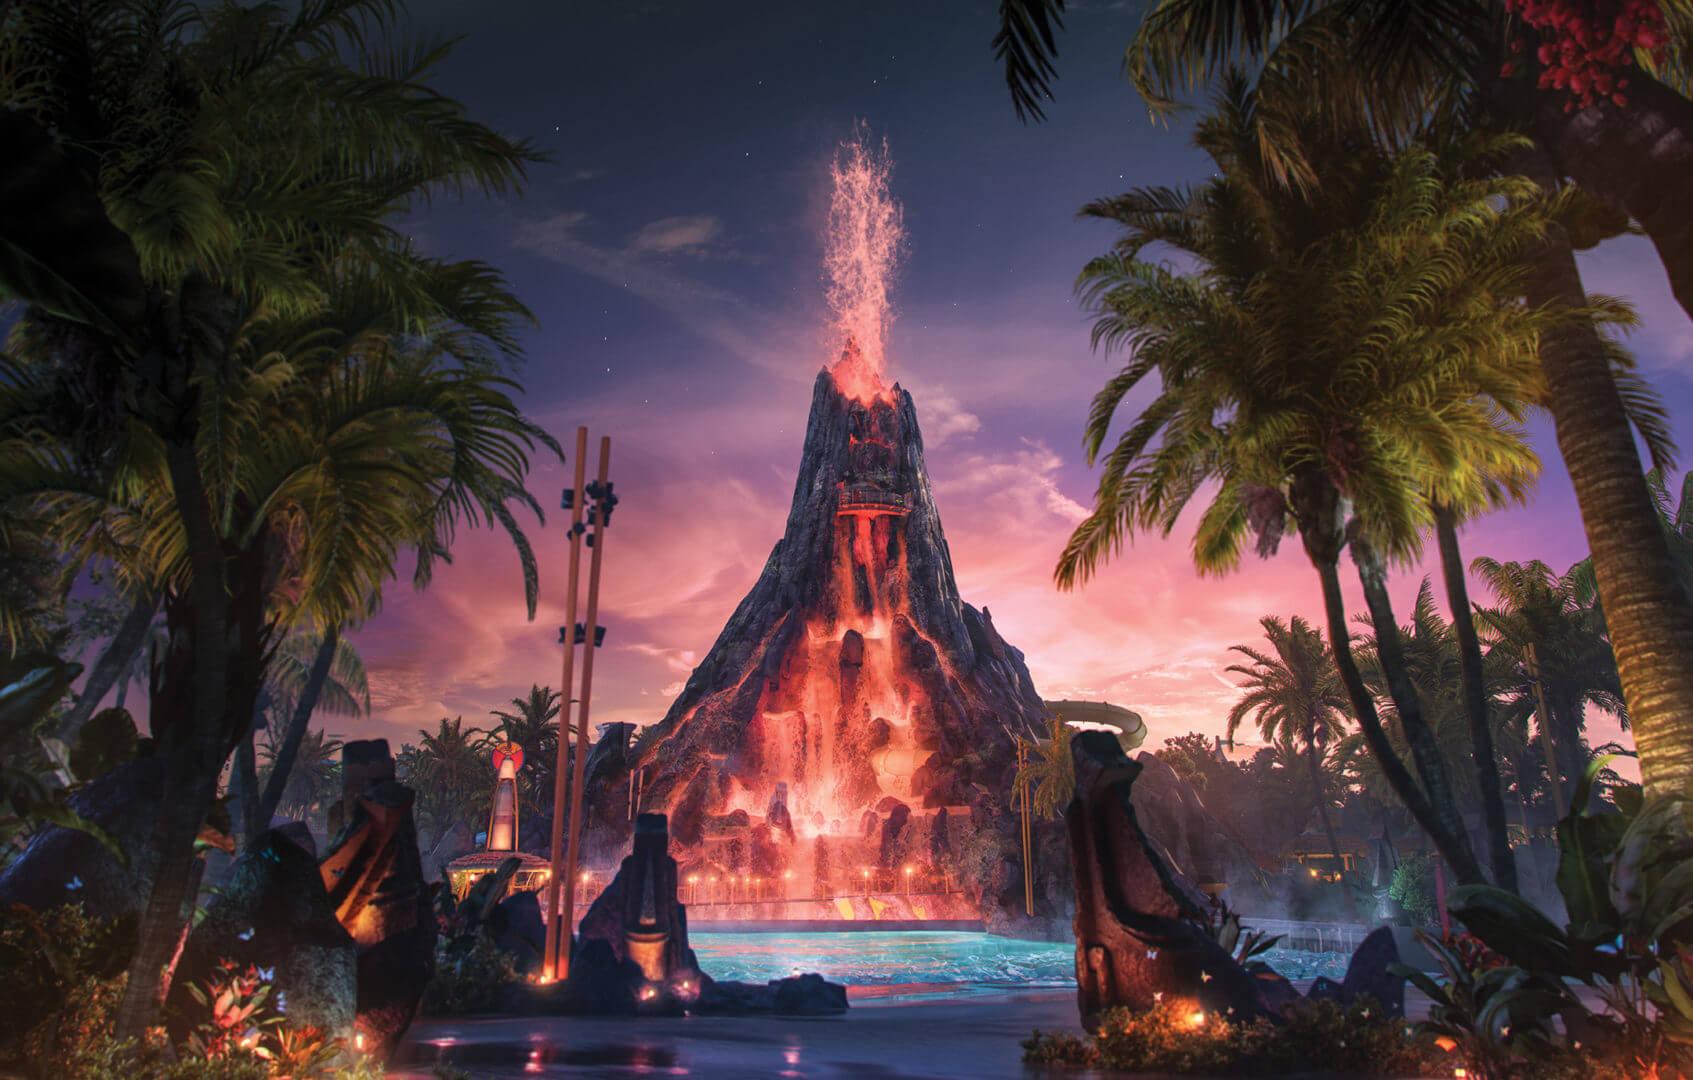 Universal's Volcano Bay_Krakatau Volcano